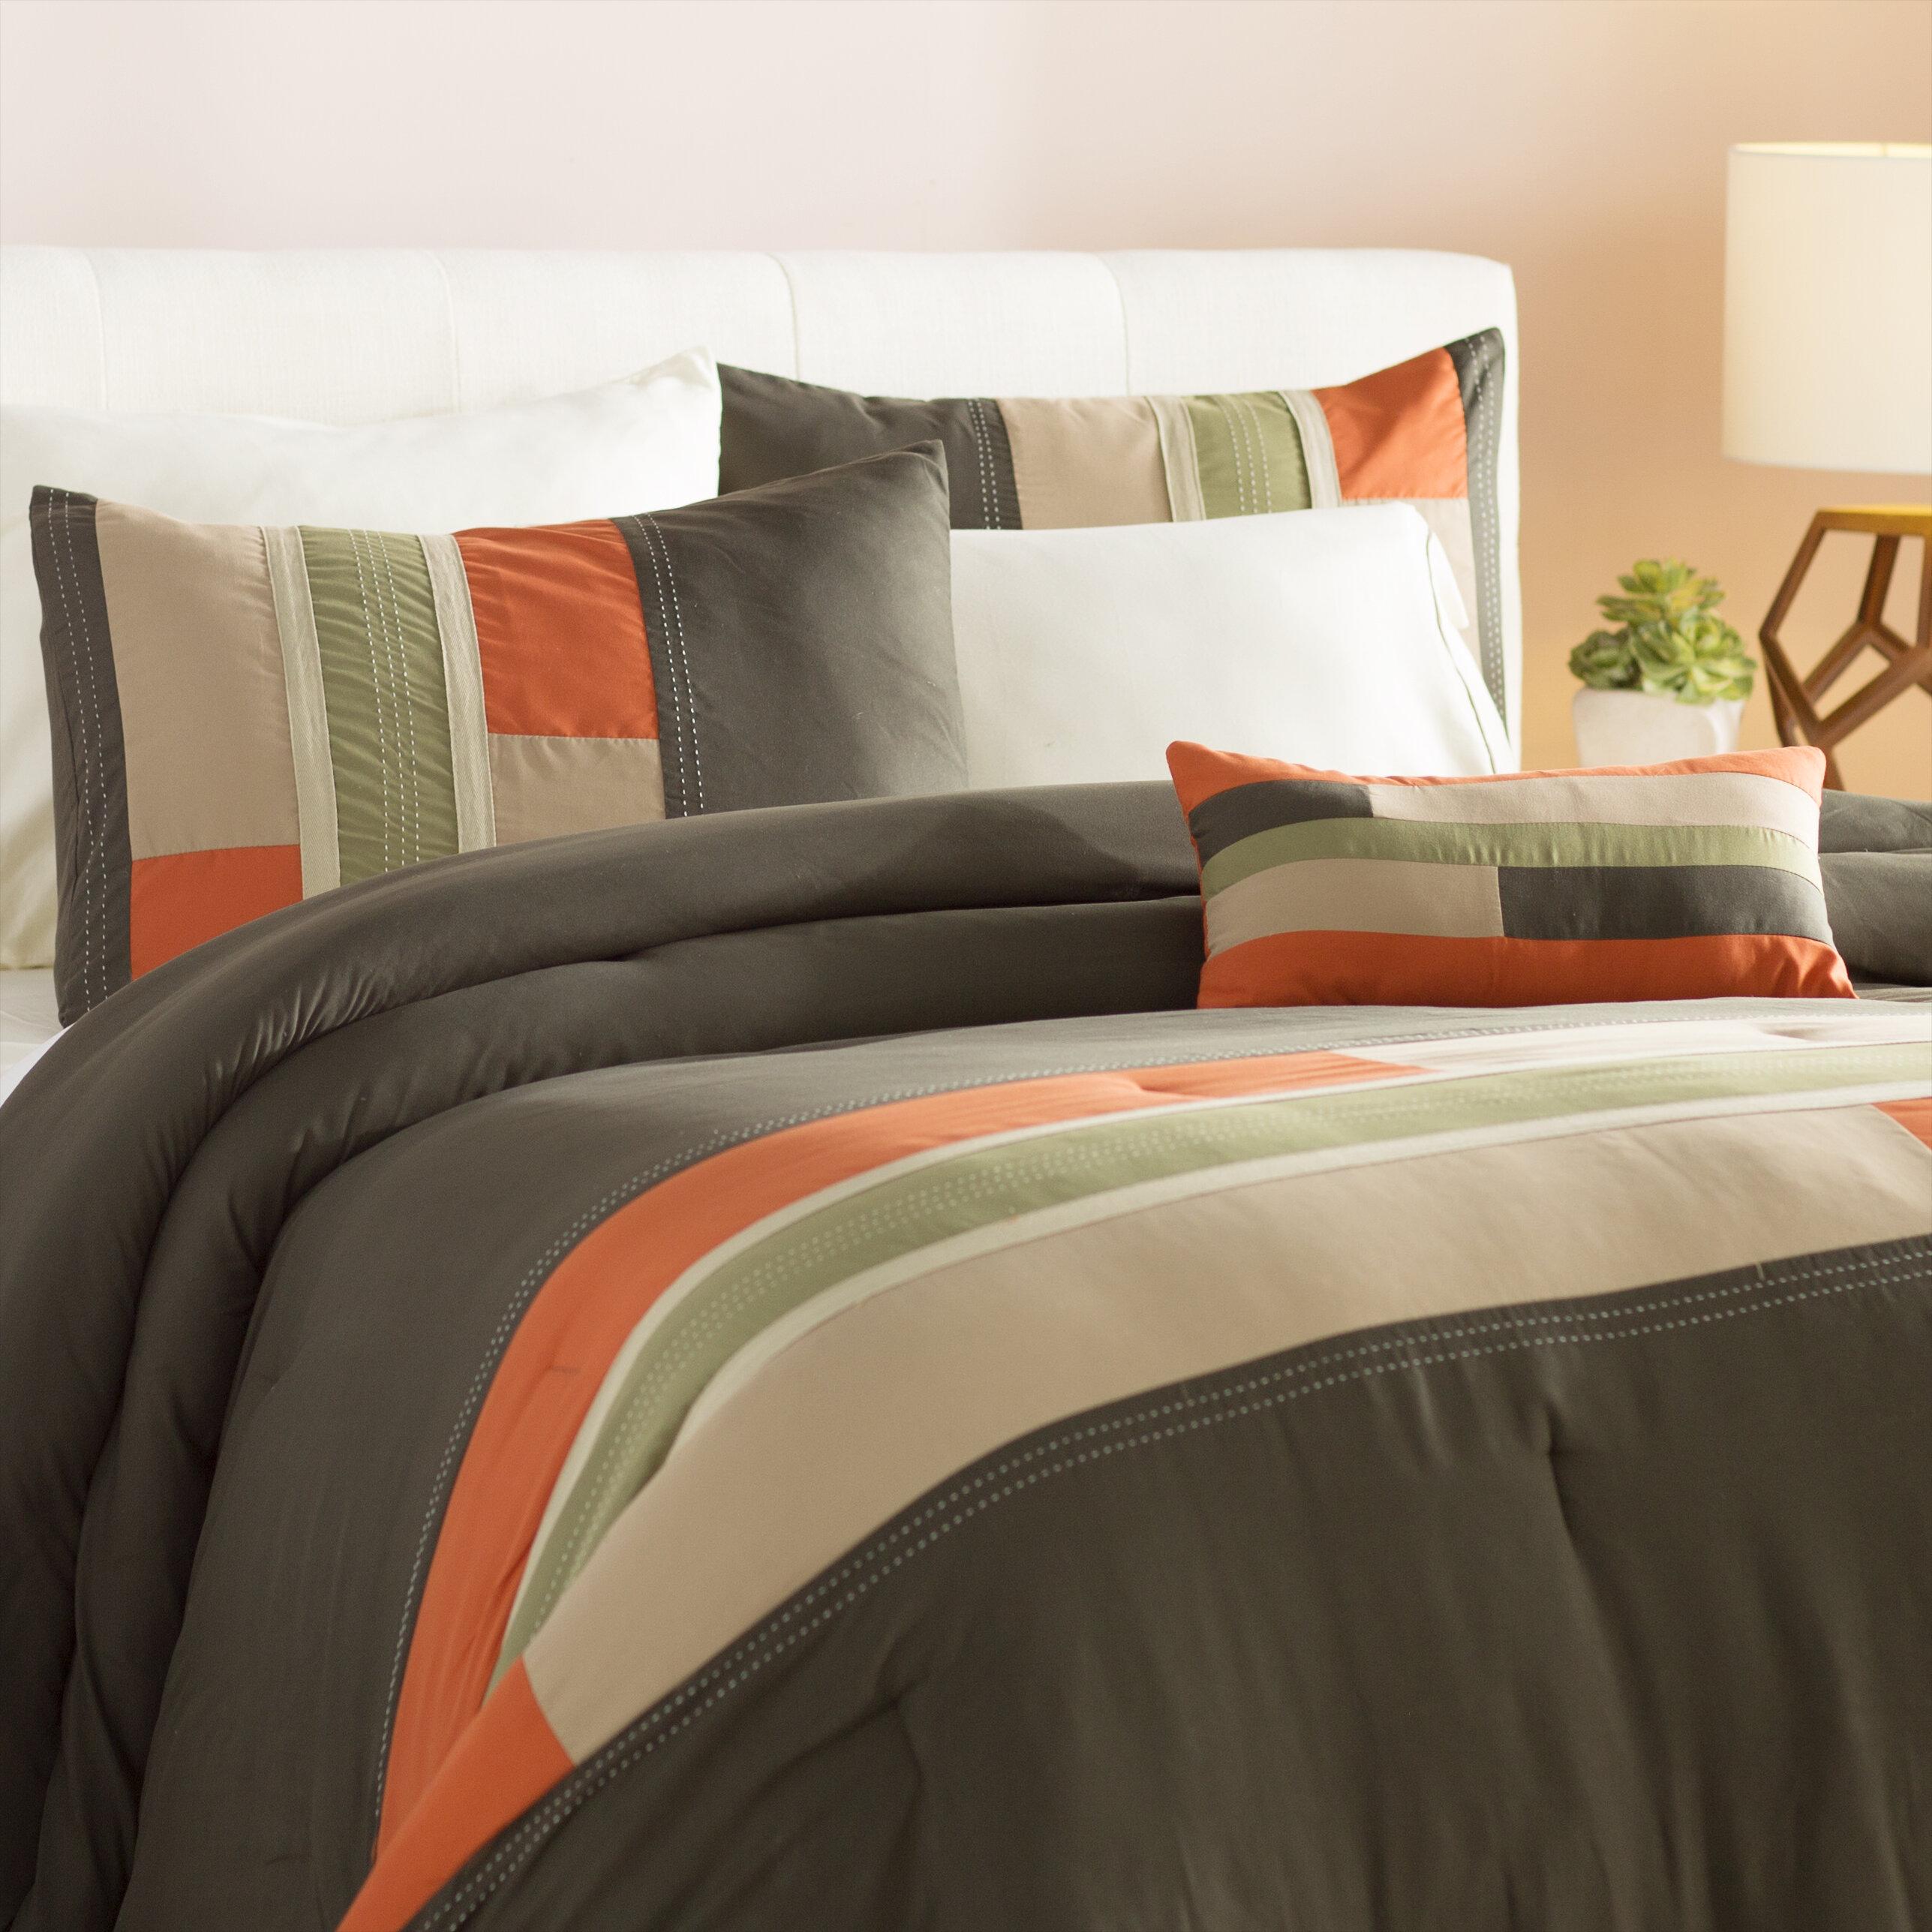 Ebern Designs Woltjen Reversible Comforter Set & Reviews | Wayfair